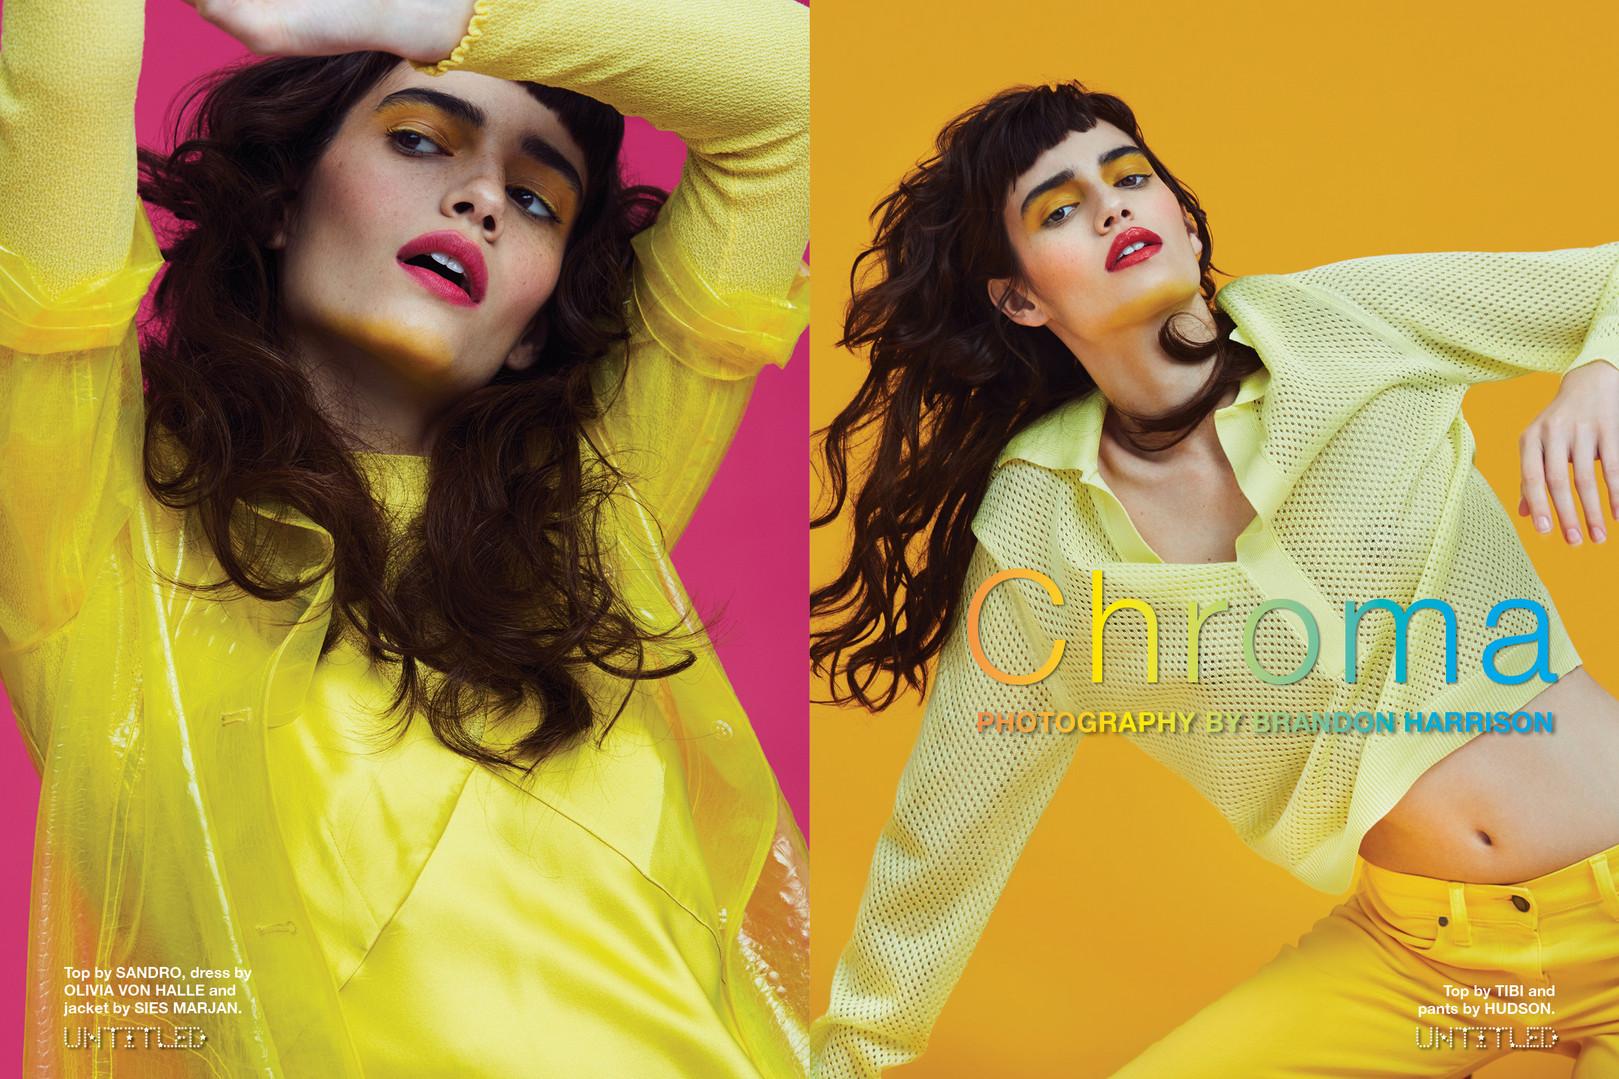 CHROMA-Photography-by-Brandon-Harrison1.